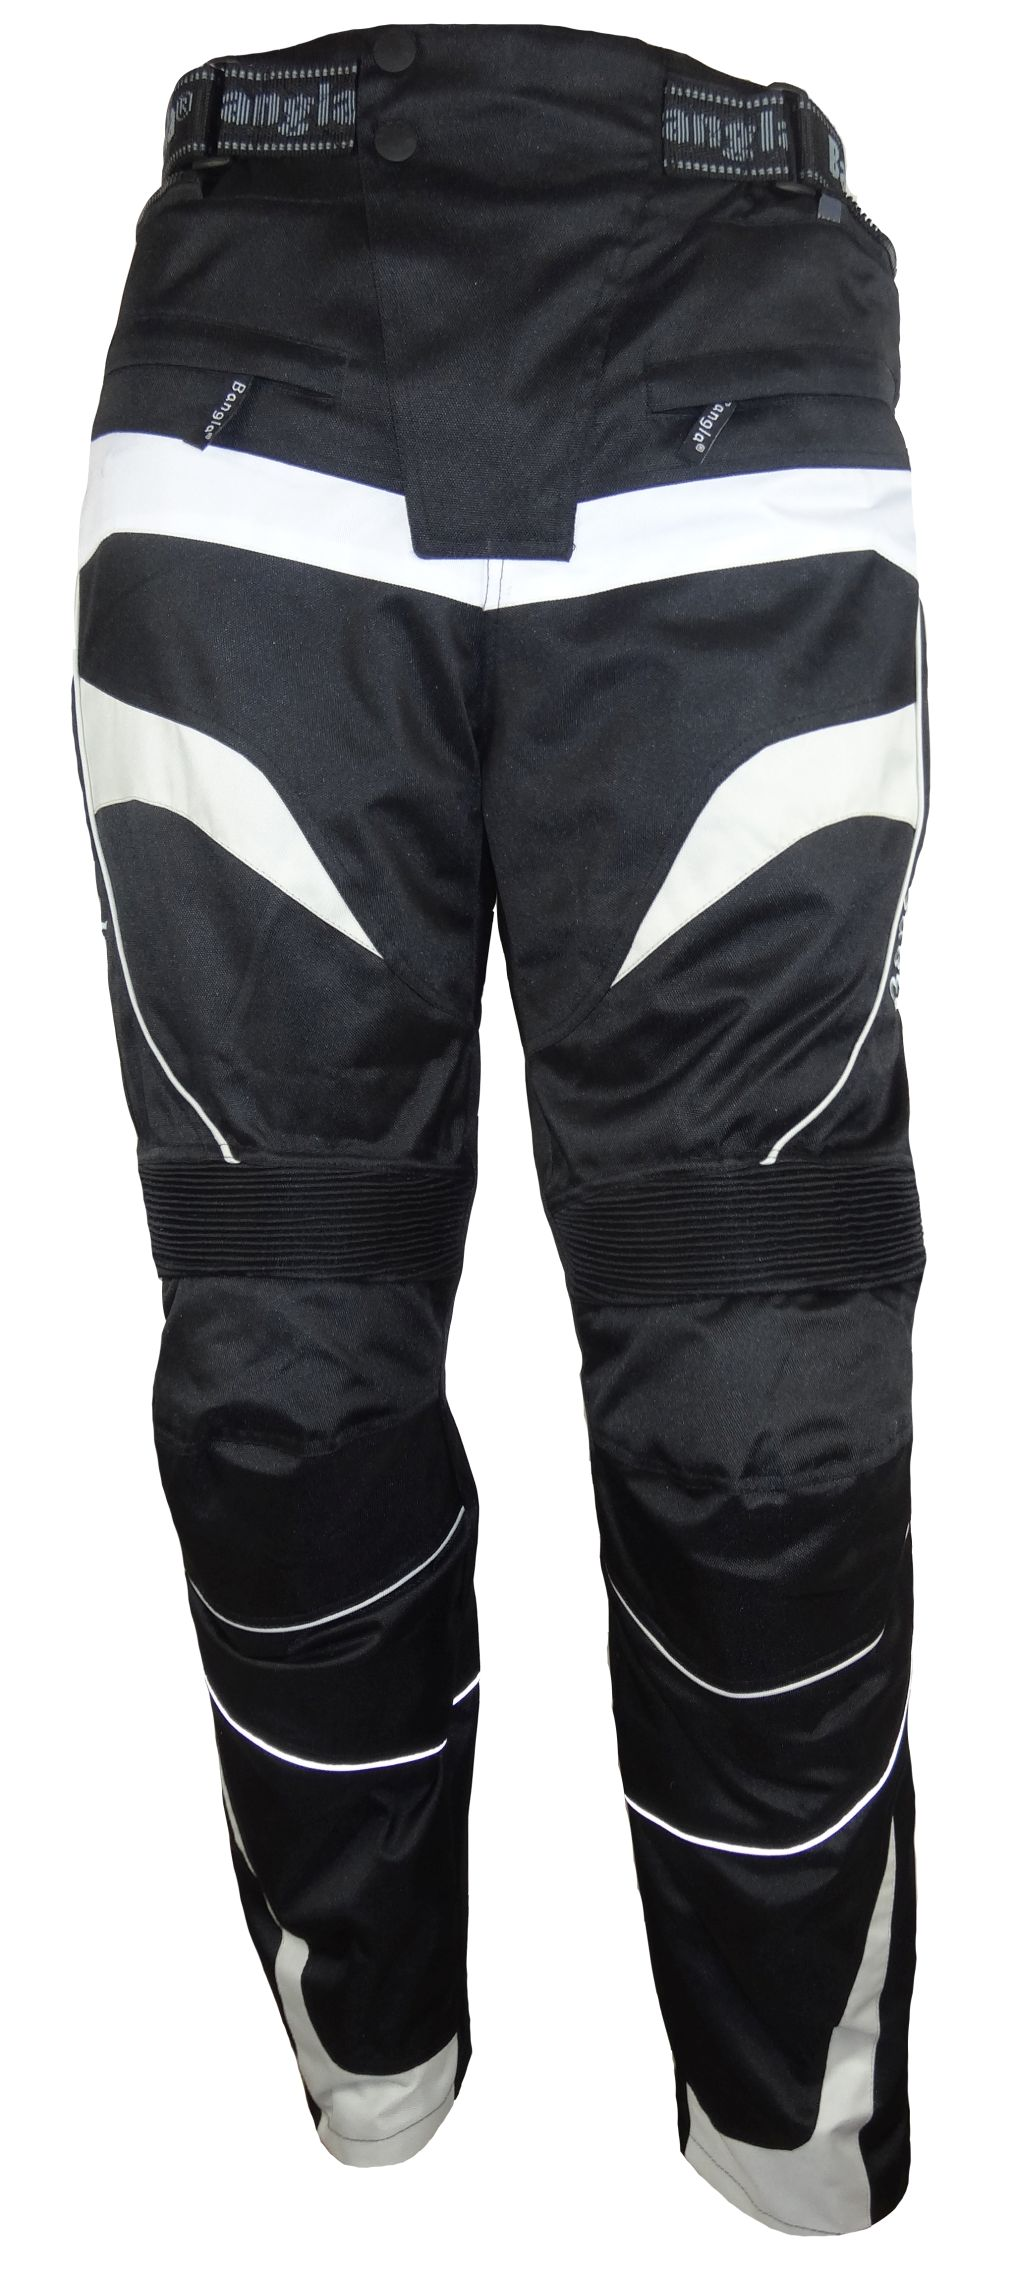 Bangla Motorrad Hose Motorradhose Textil Cordura schwarz grau weiss S - 8 XL